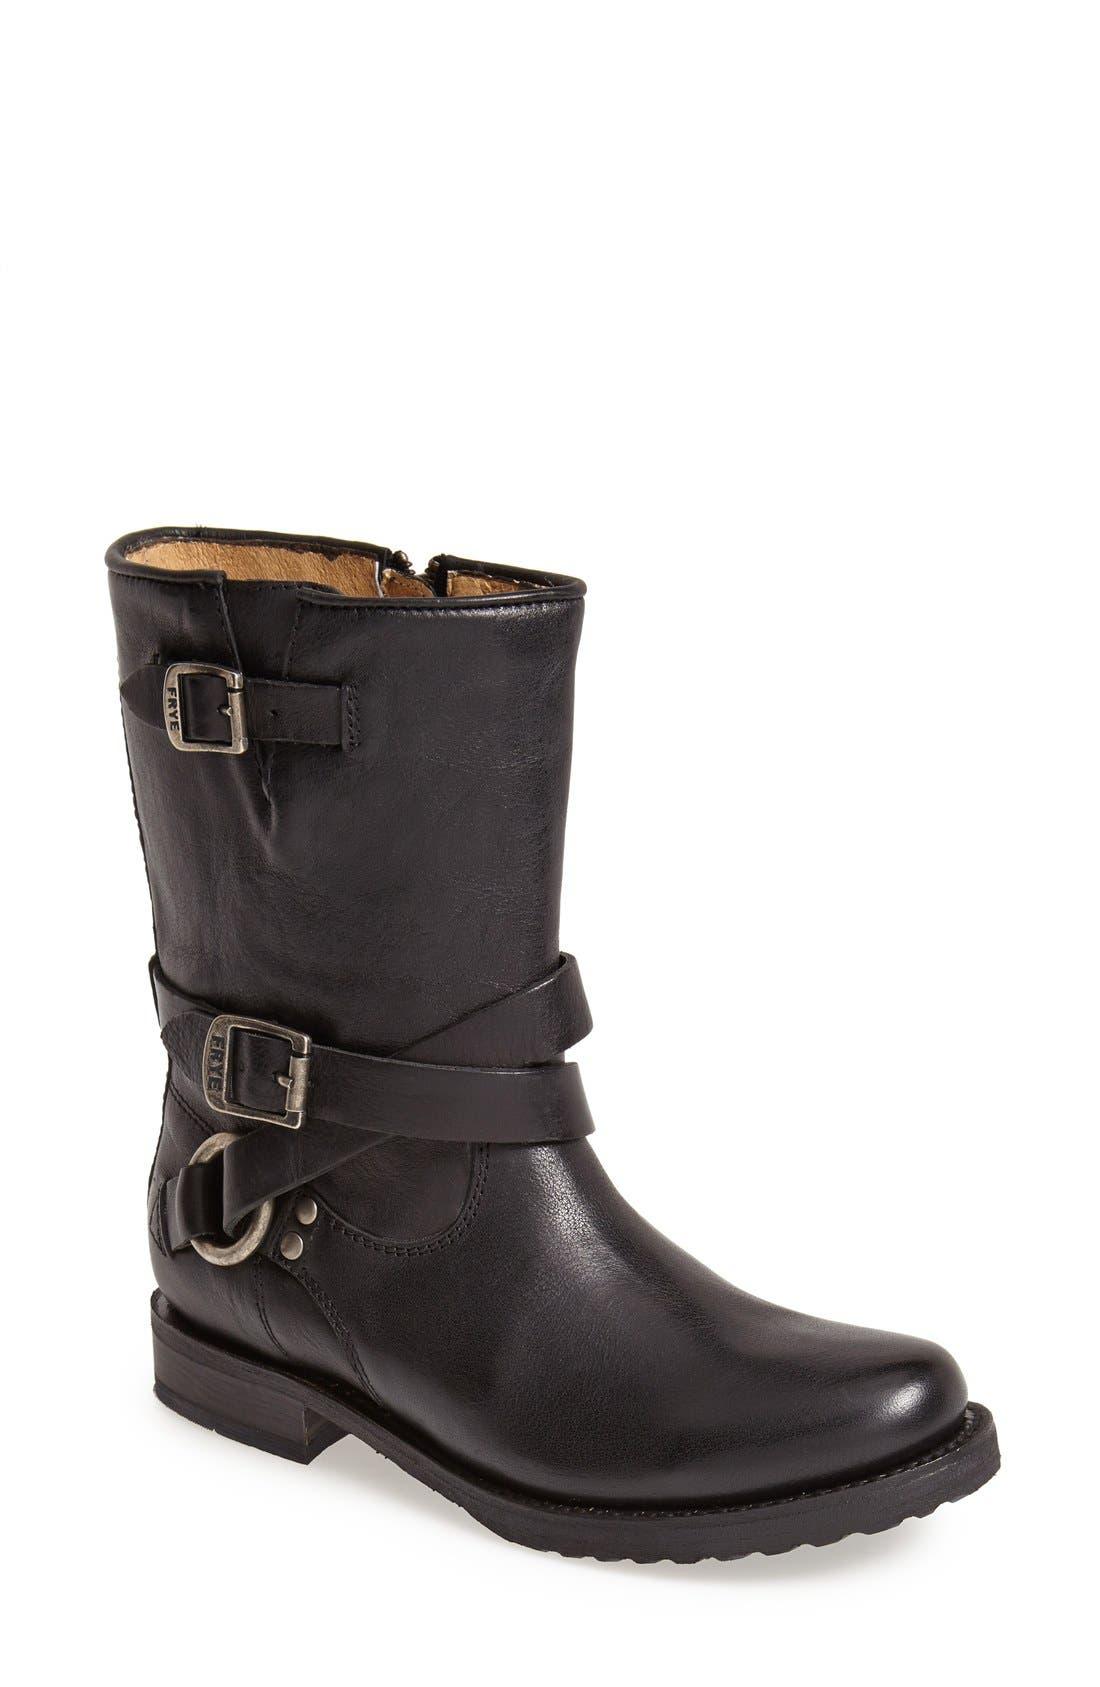 Main Image - Frye 'Veronica' Crisscross Strap Short Leather Boot (Women)